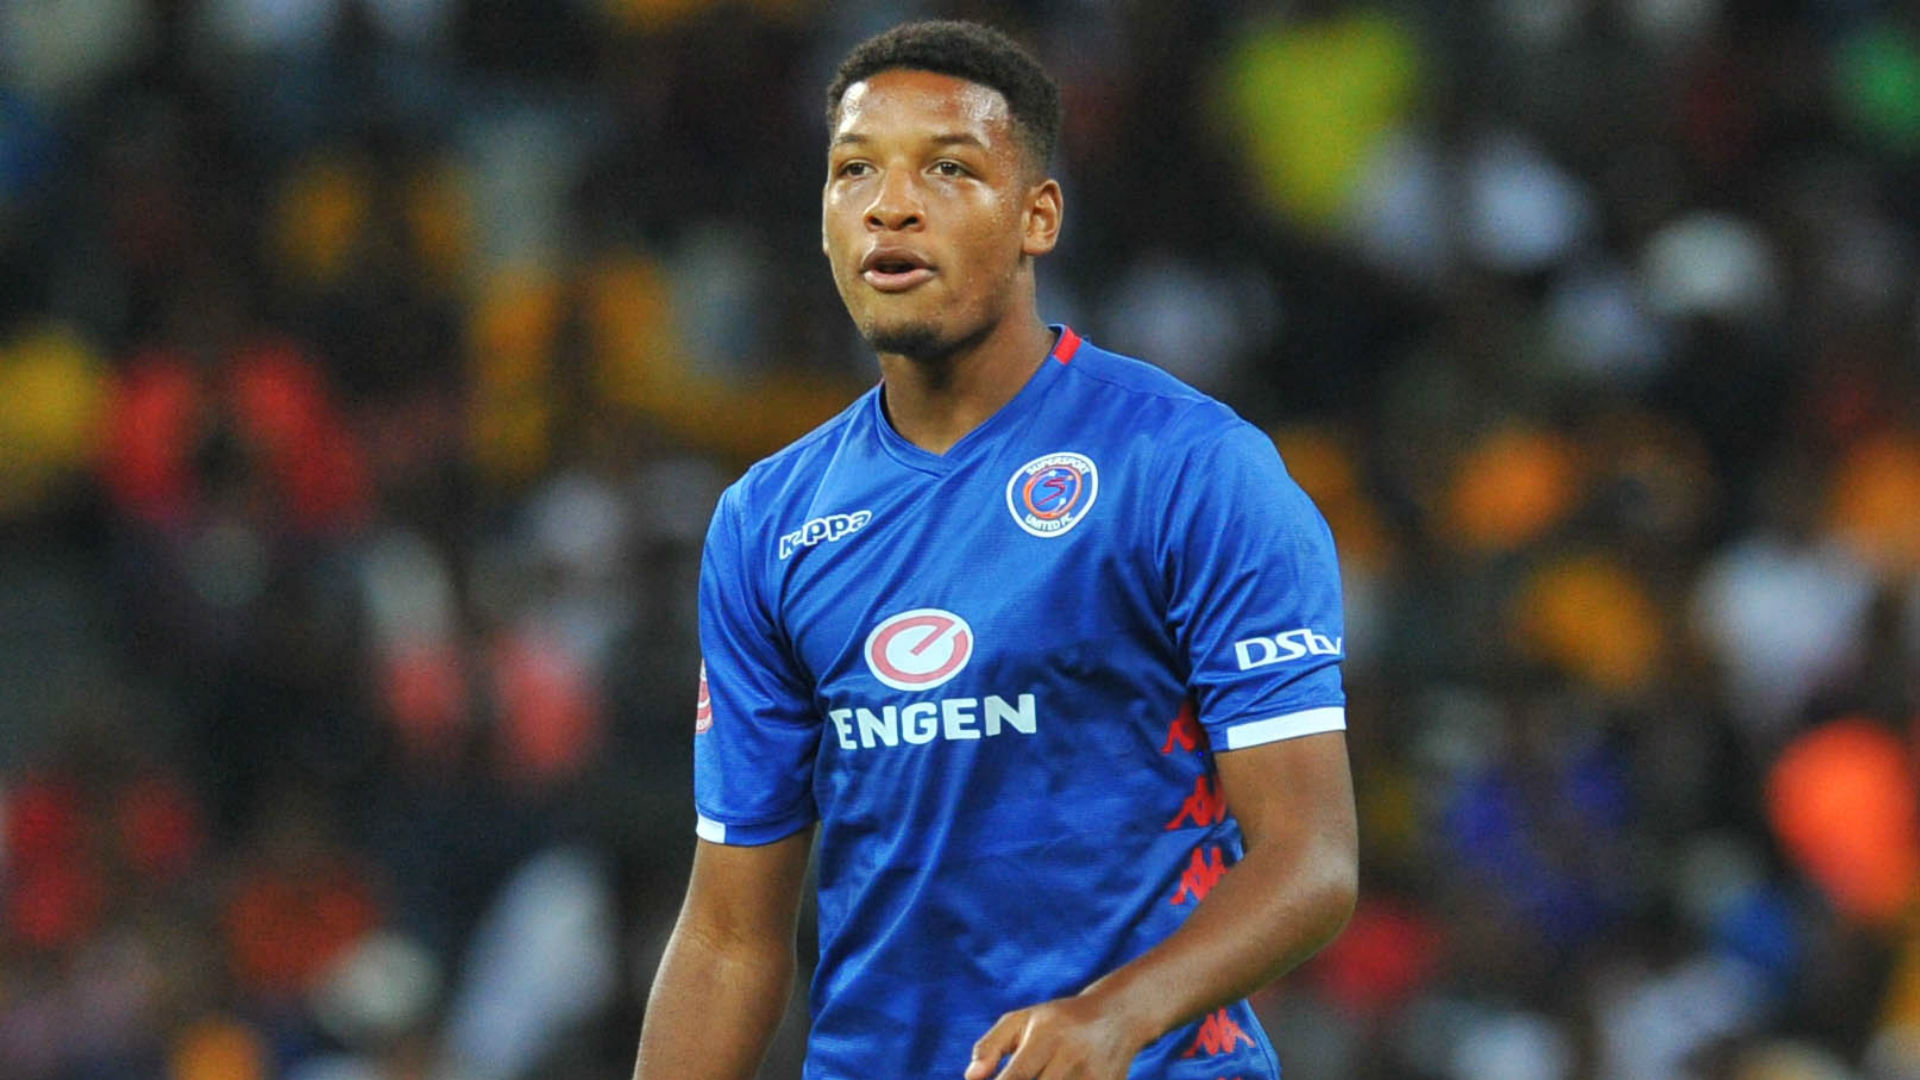 LIVE BLOG: PSL strugglers clash in Cape Town, Bloemfontein Celtic host Chippa United & Polokwane City take on SuperSport United